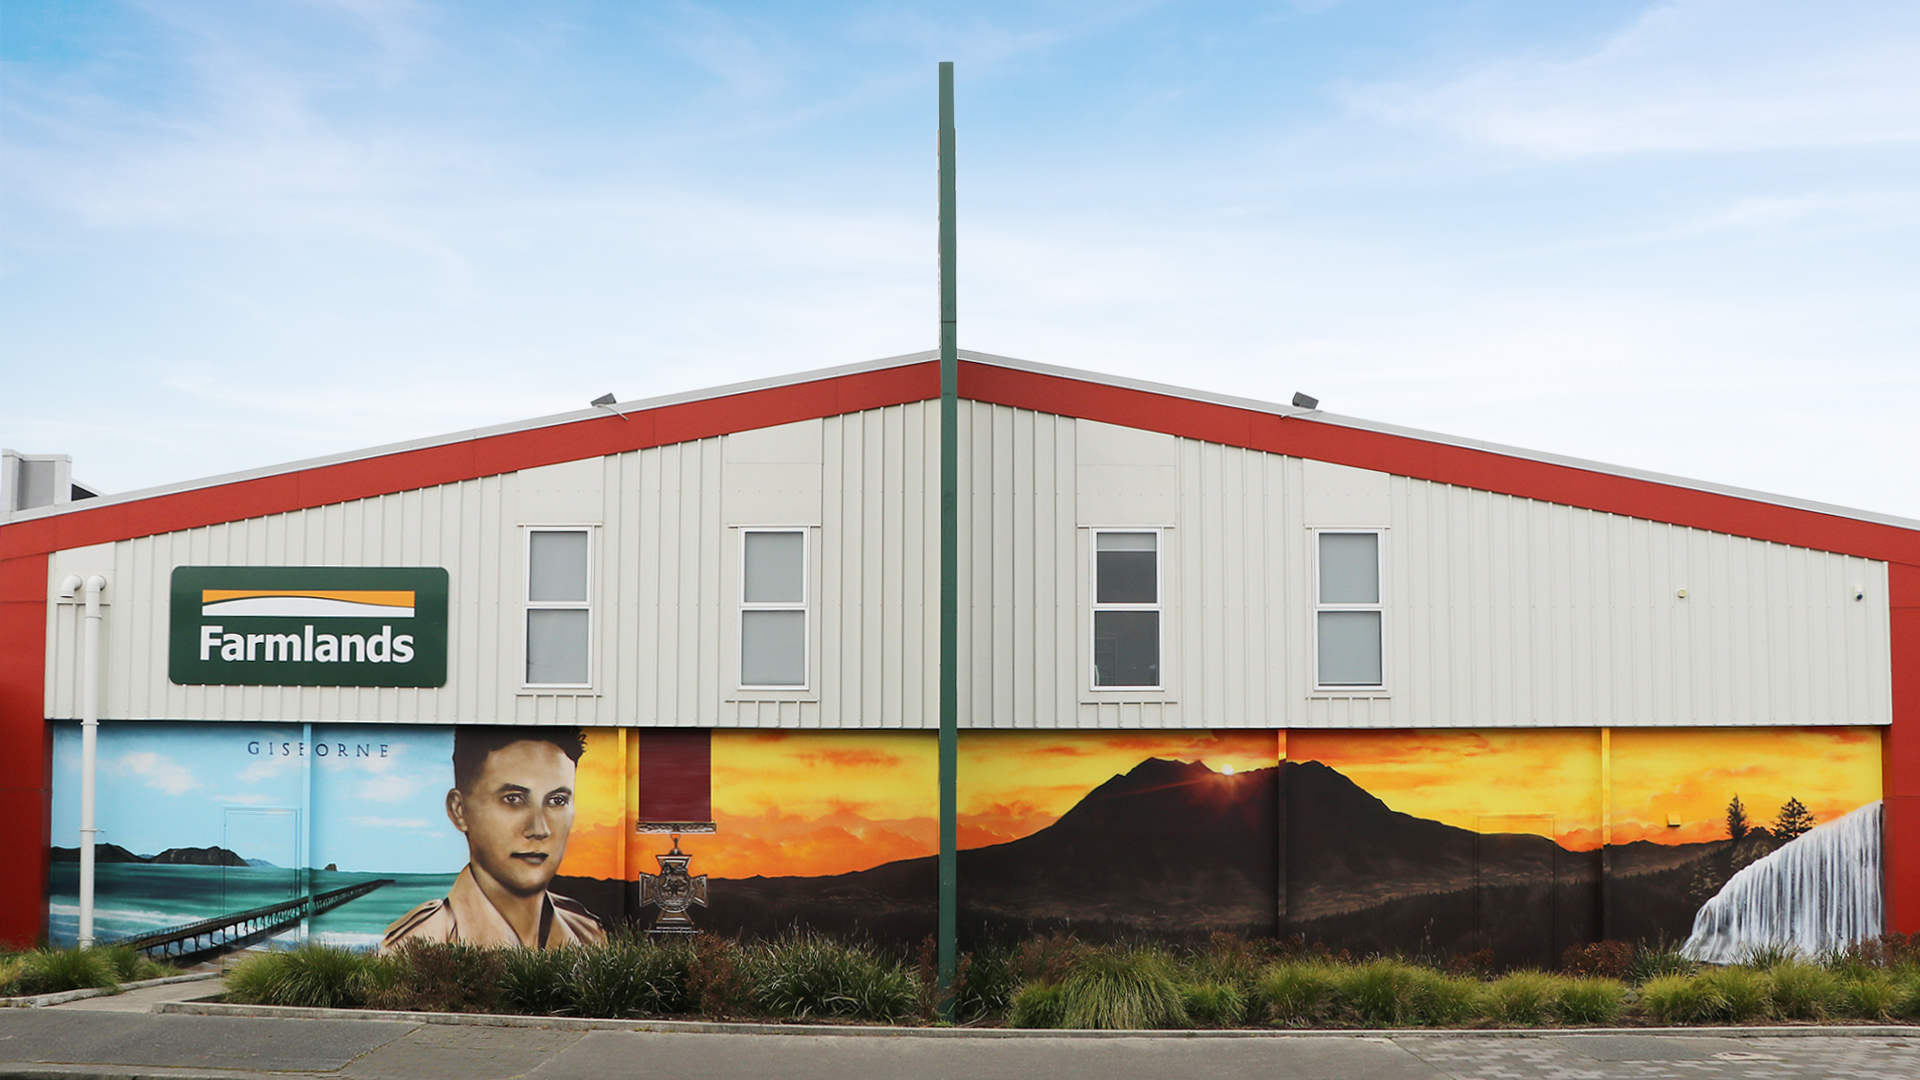 Gisborne_HOTC_Mural.jpg